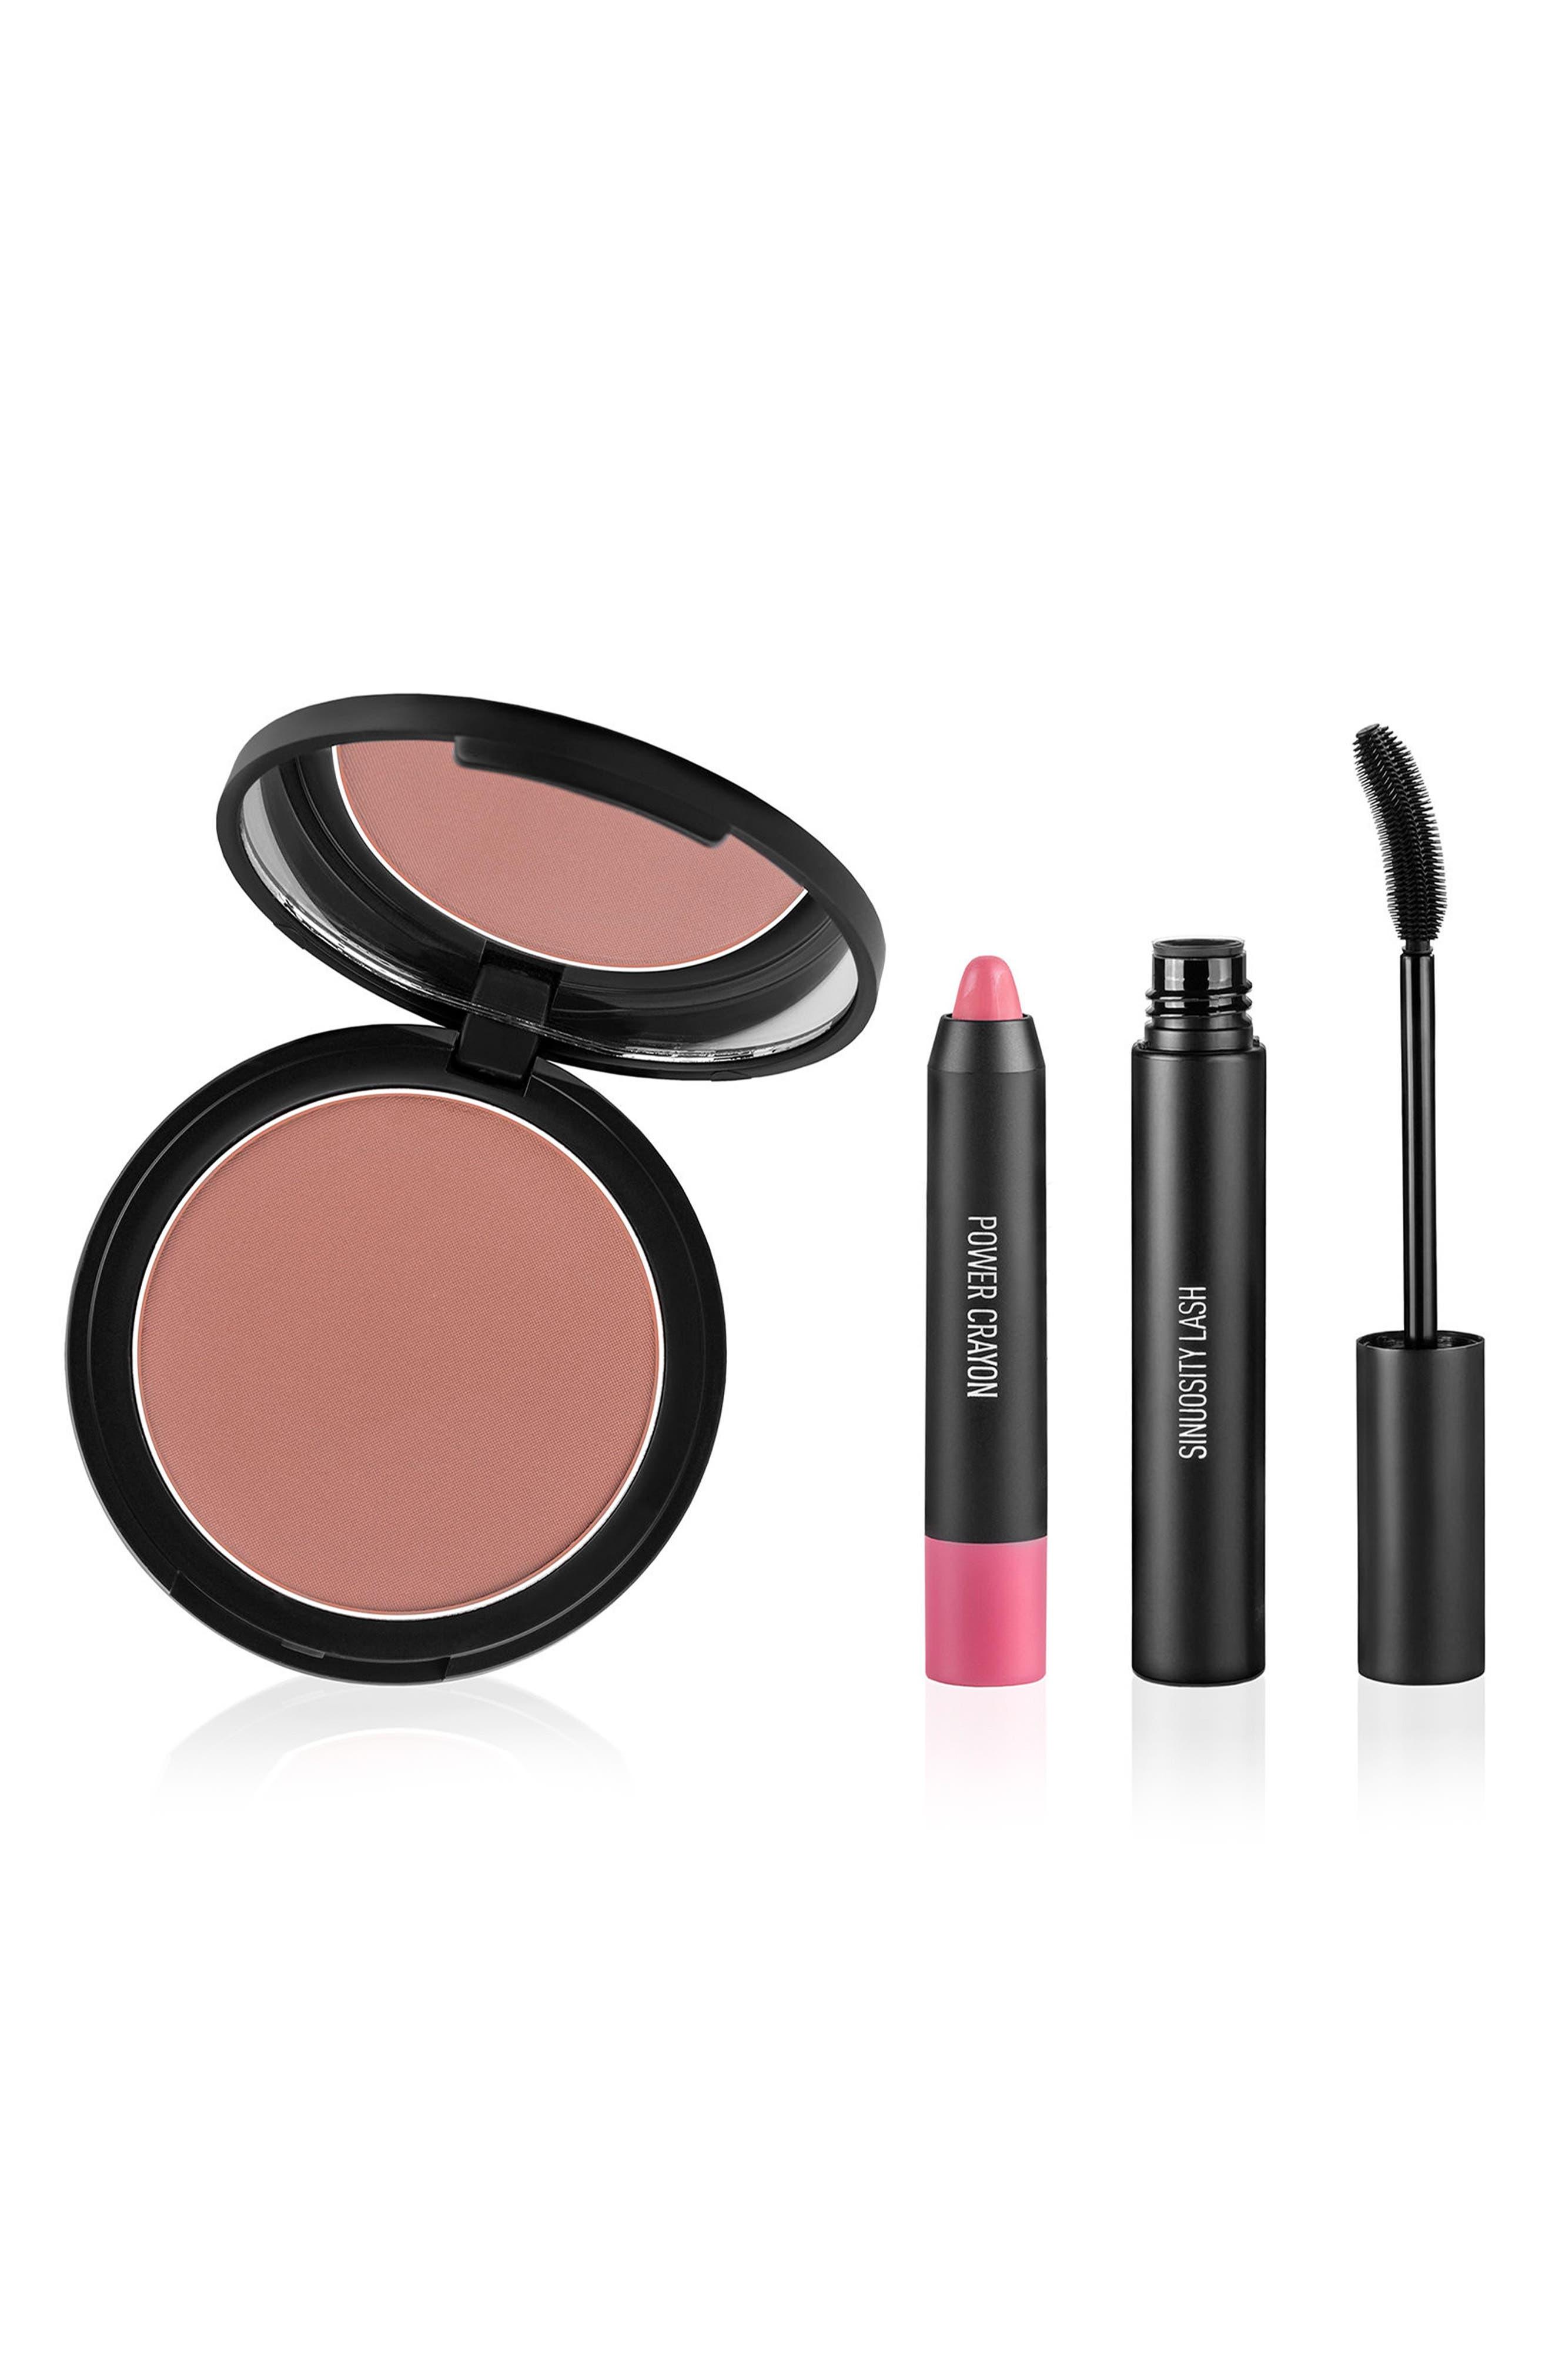 Sigma Beauty Naturally Polished Makeup Set